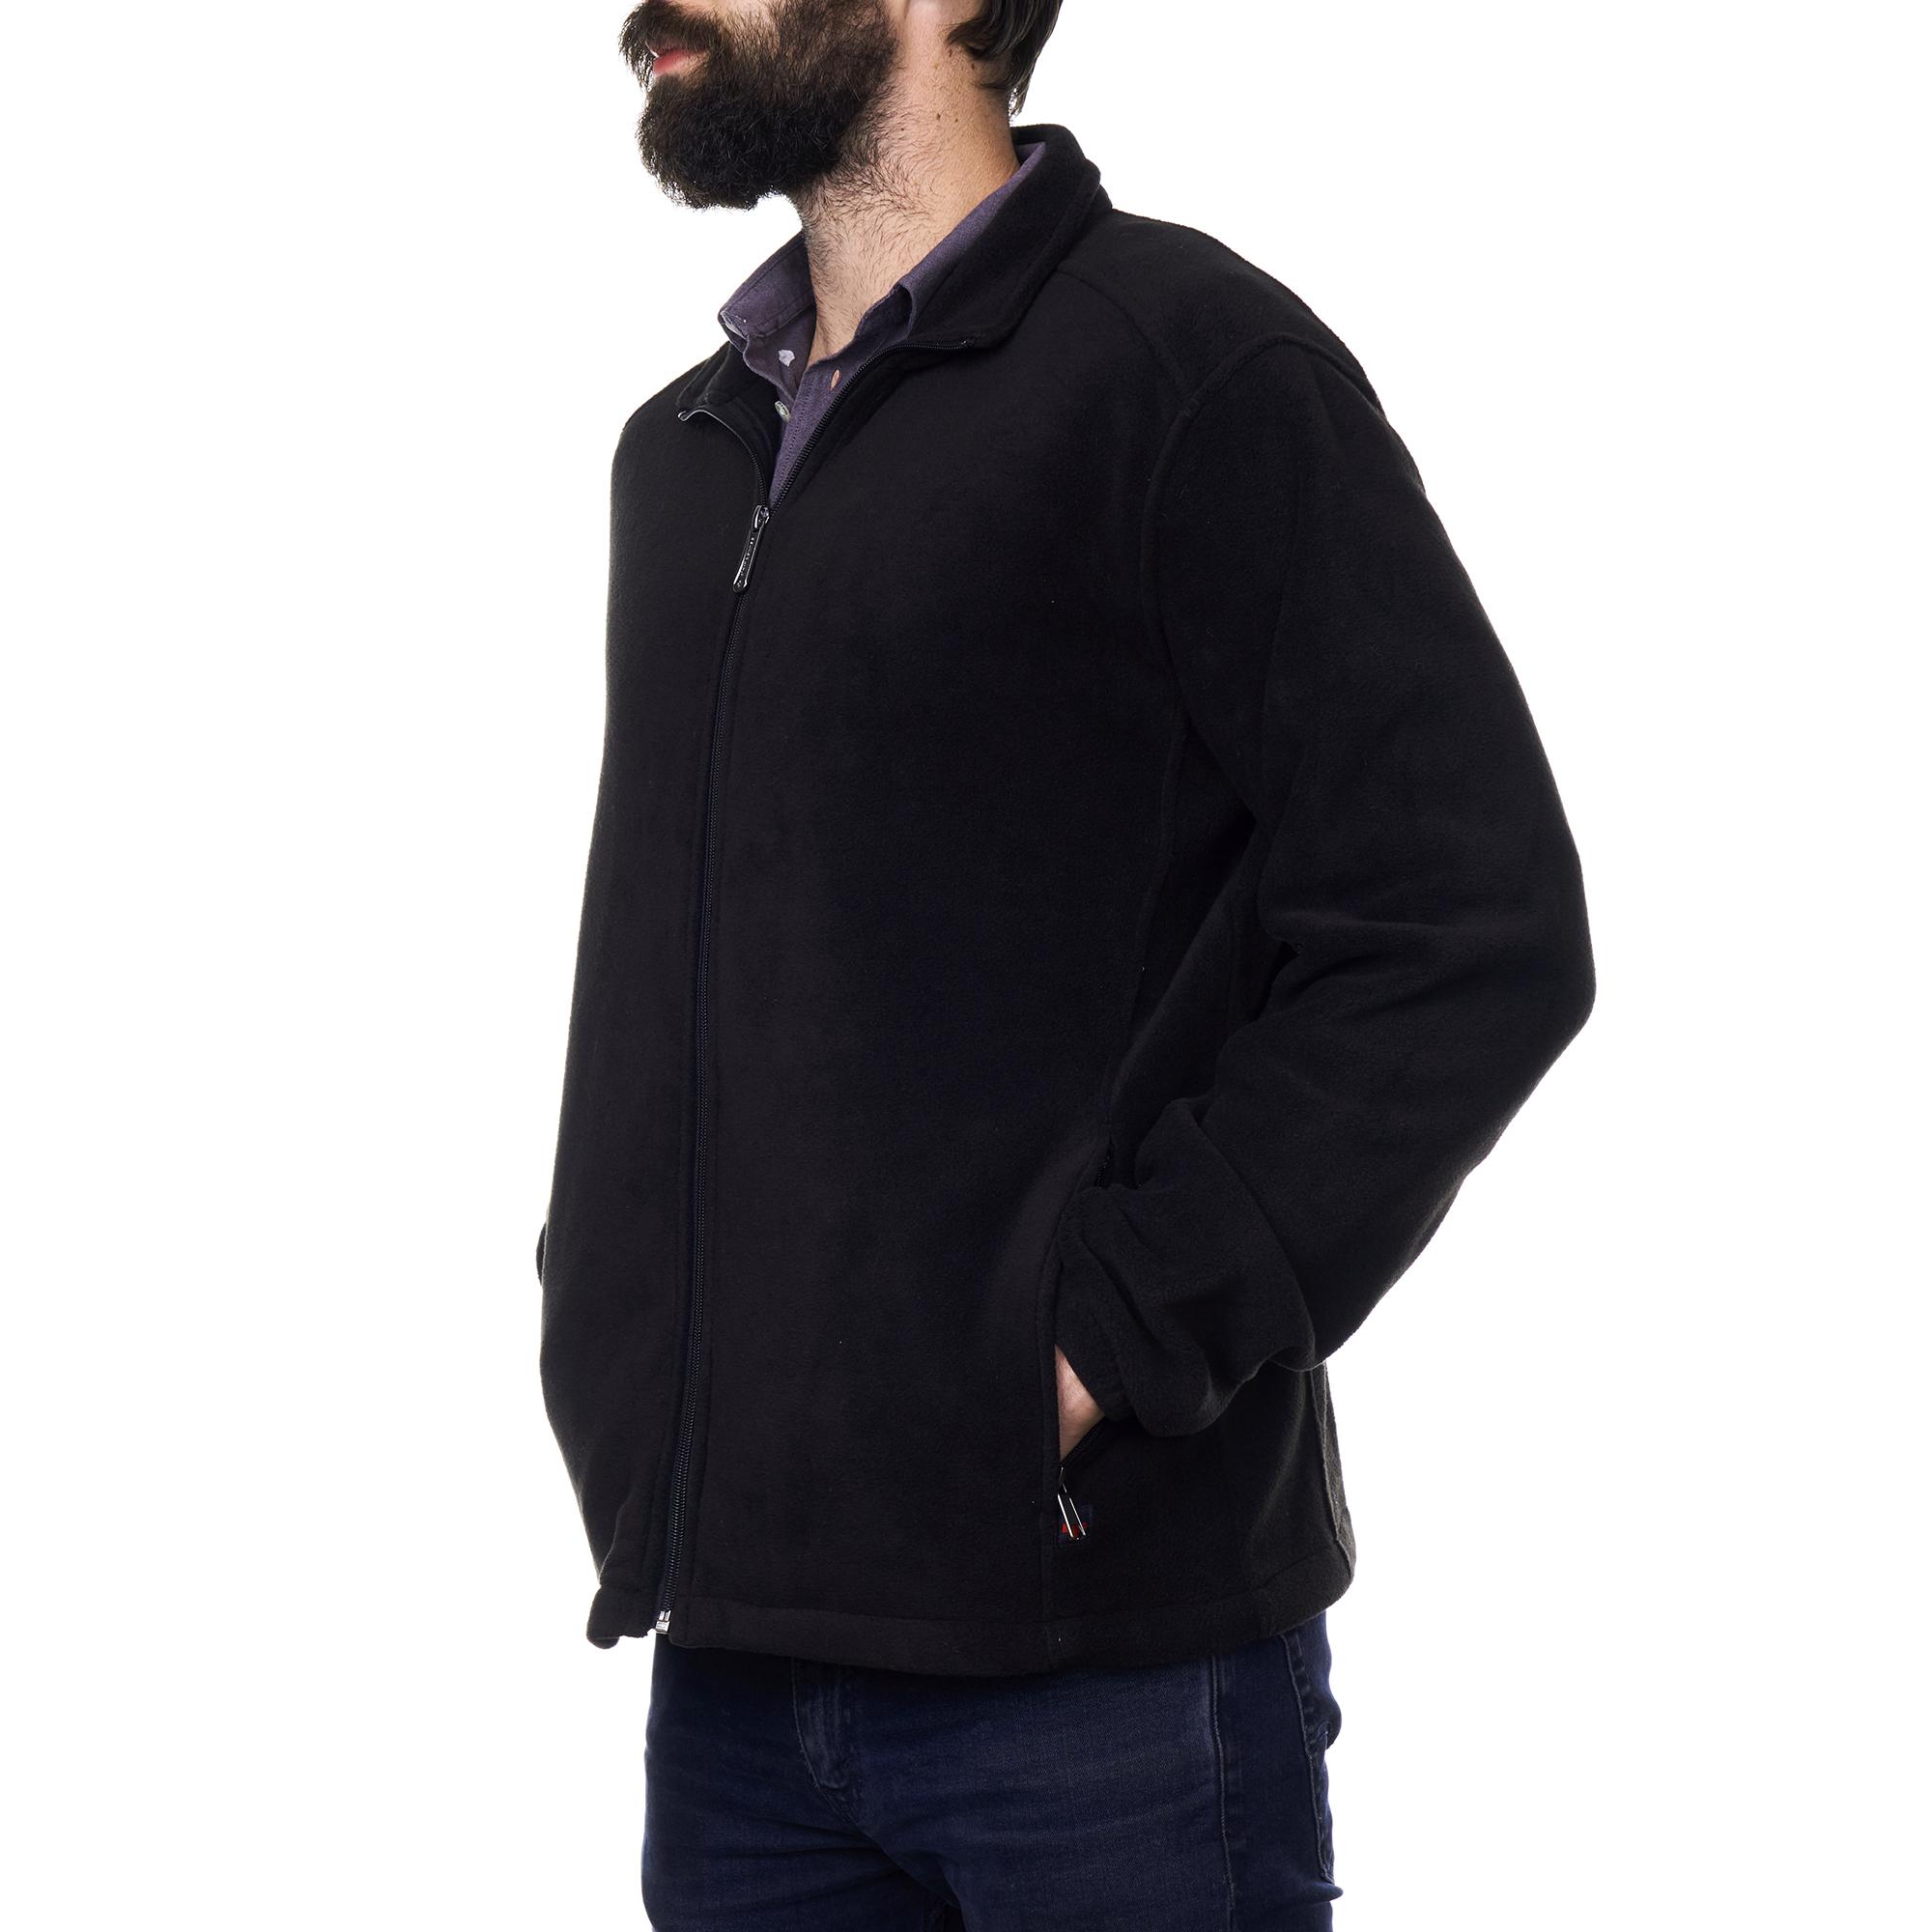 Alpine-Swiss-Trent-Mens-Full-Zip-Up-Fleece-Jacket-Soft-Casual-Warm-Zipper-Coat thumbnail 15